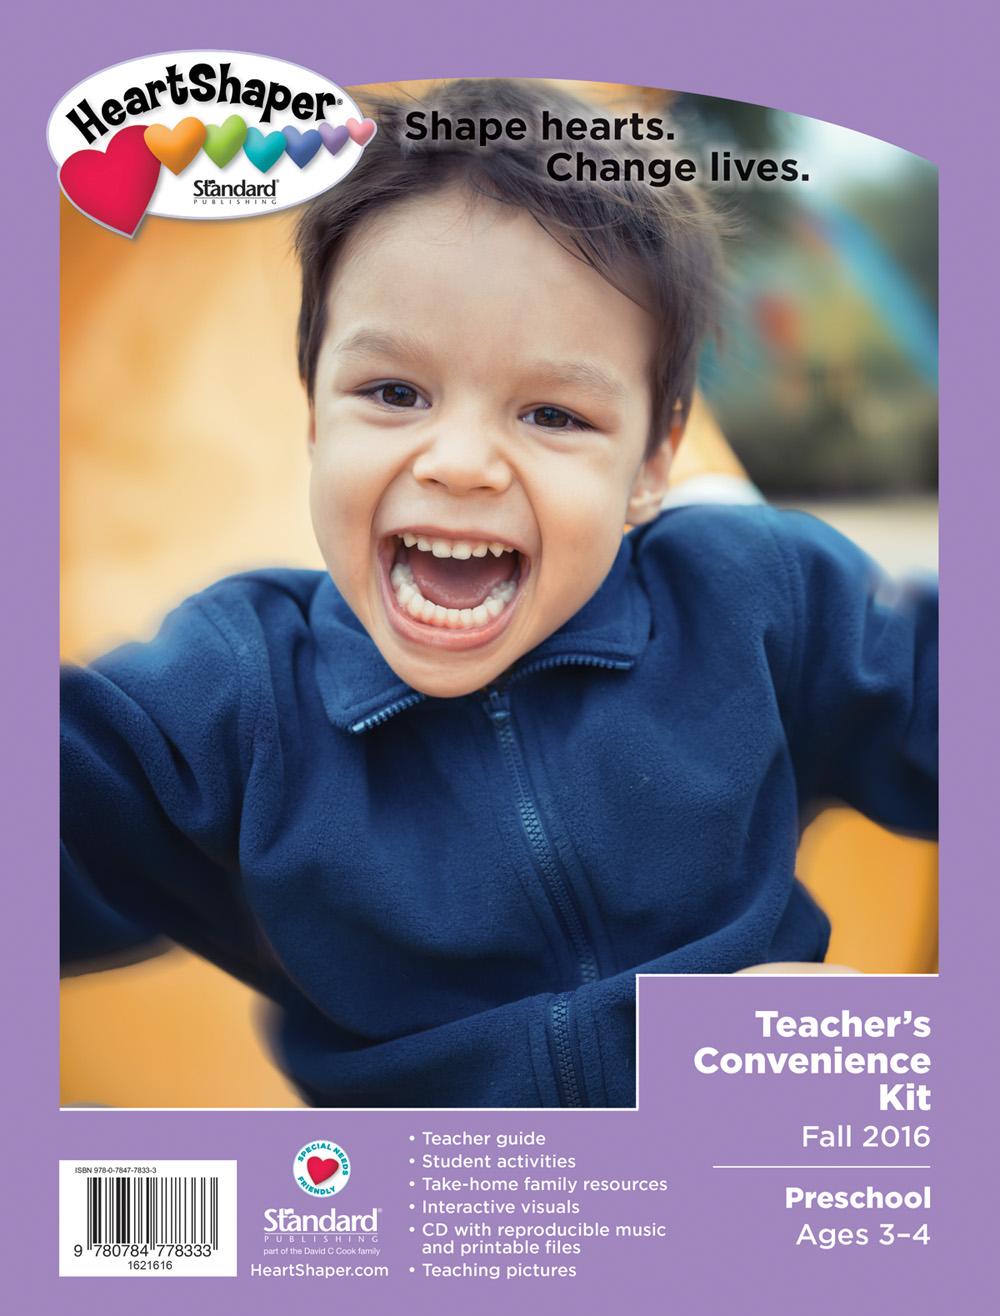 Preschool Teacher's Kit - Sunday School Curriculum Classes